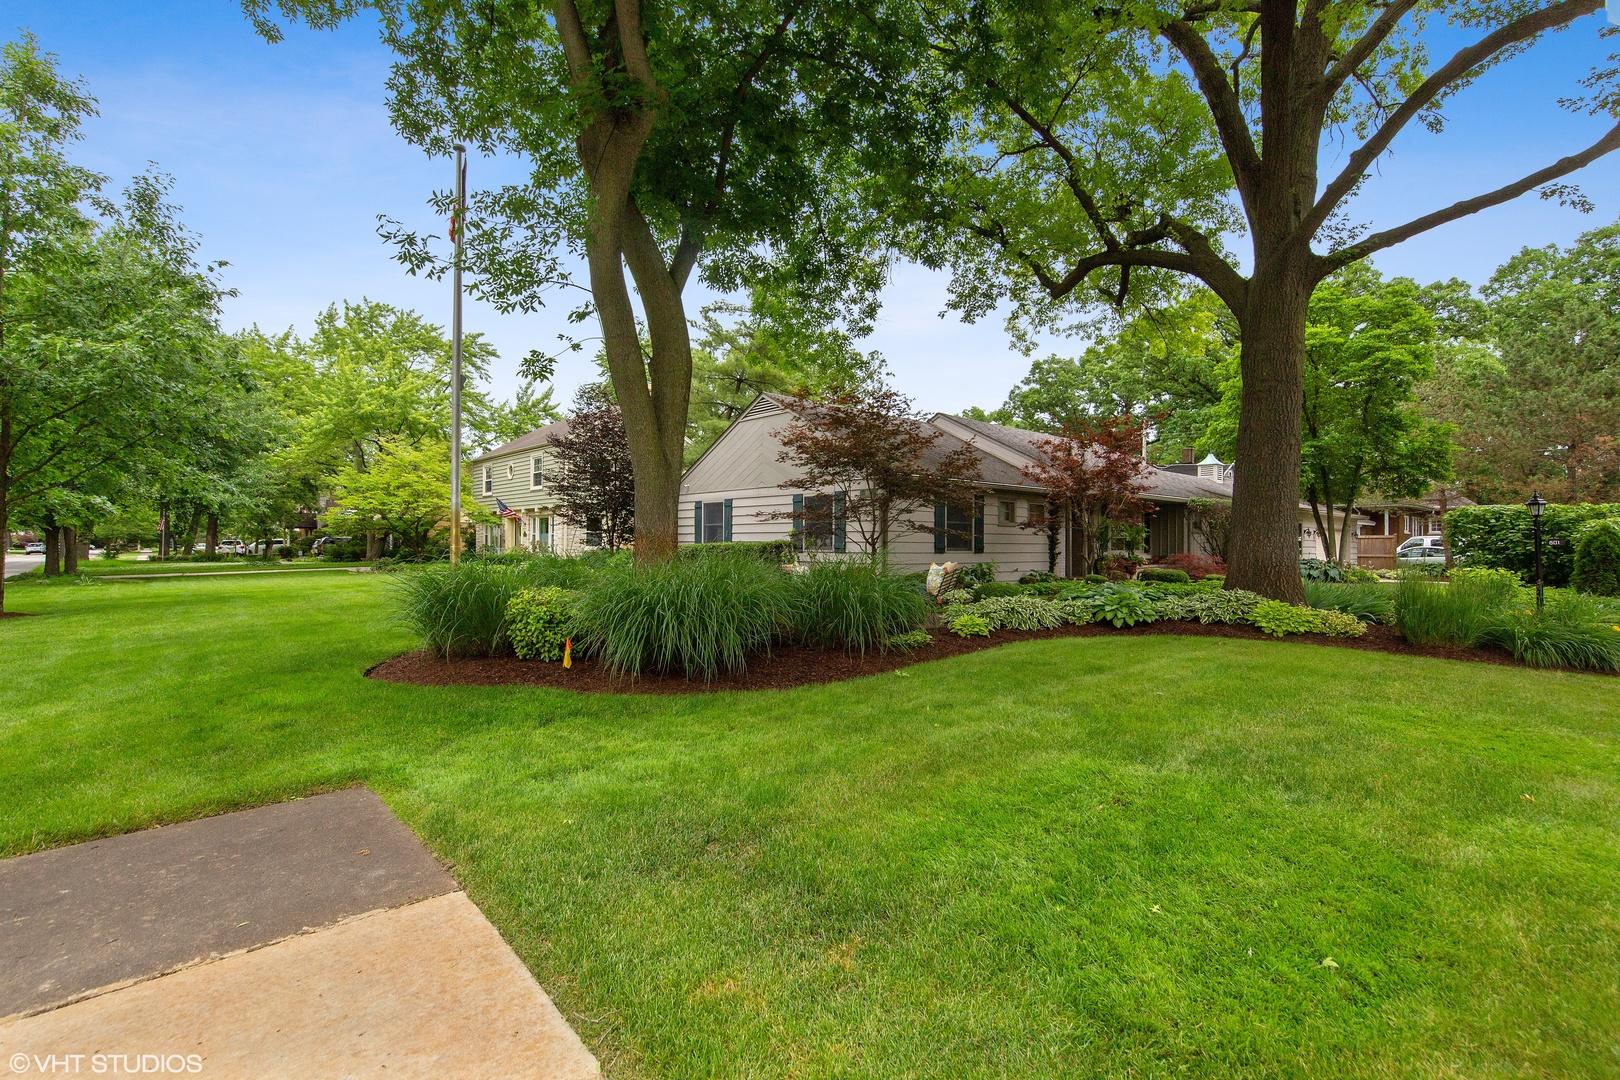 801 North Spring, LA GRANGE PARK, Illinois, 60526